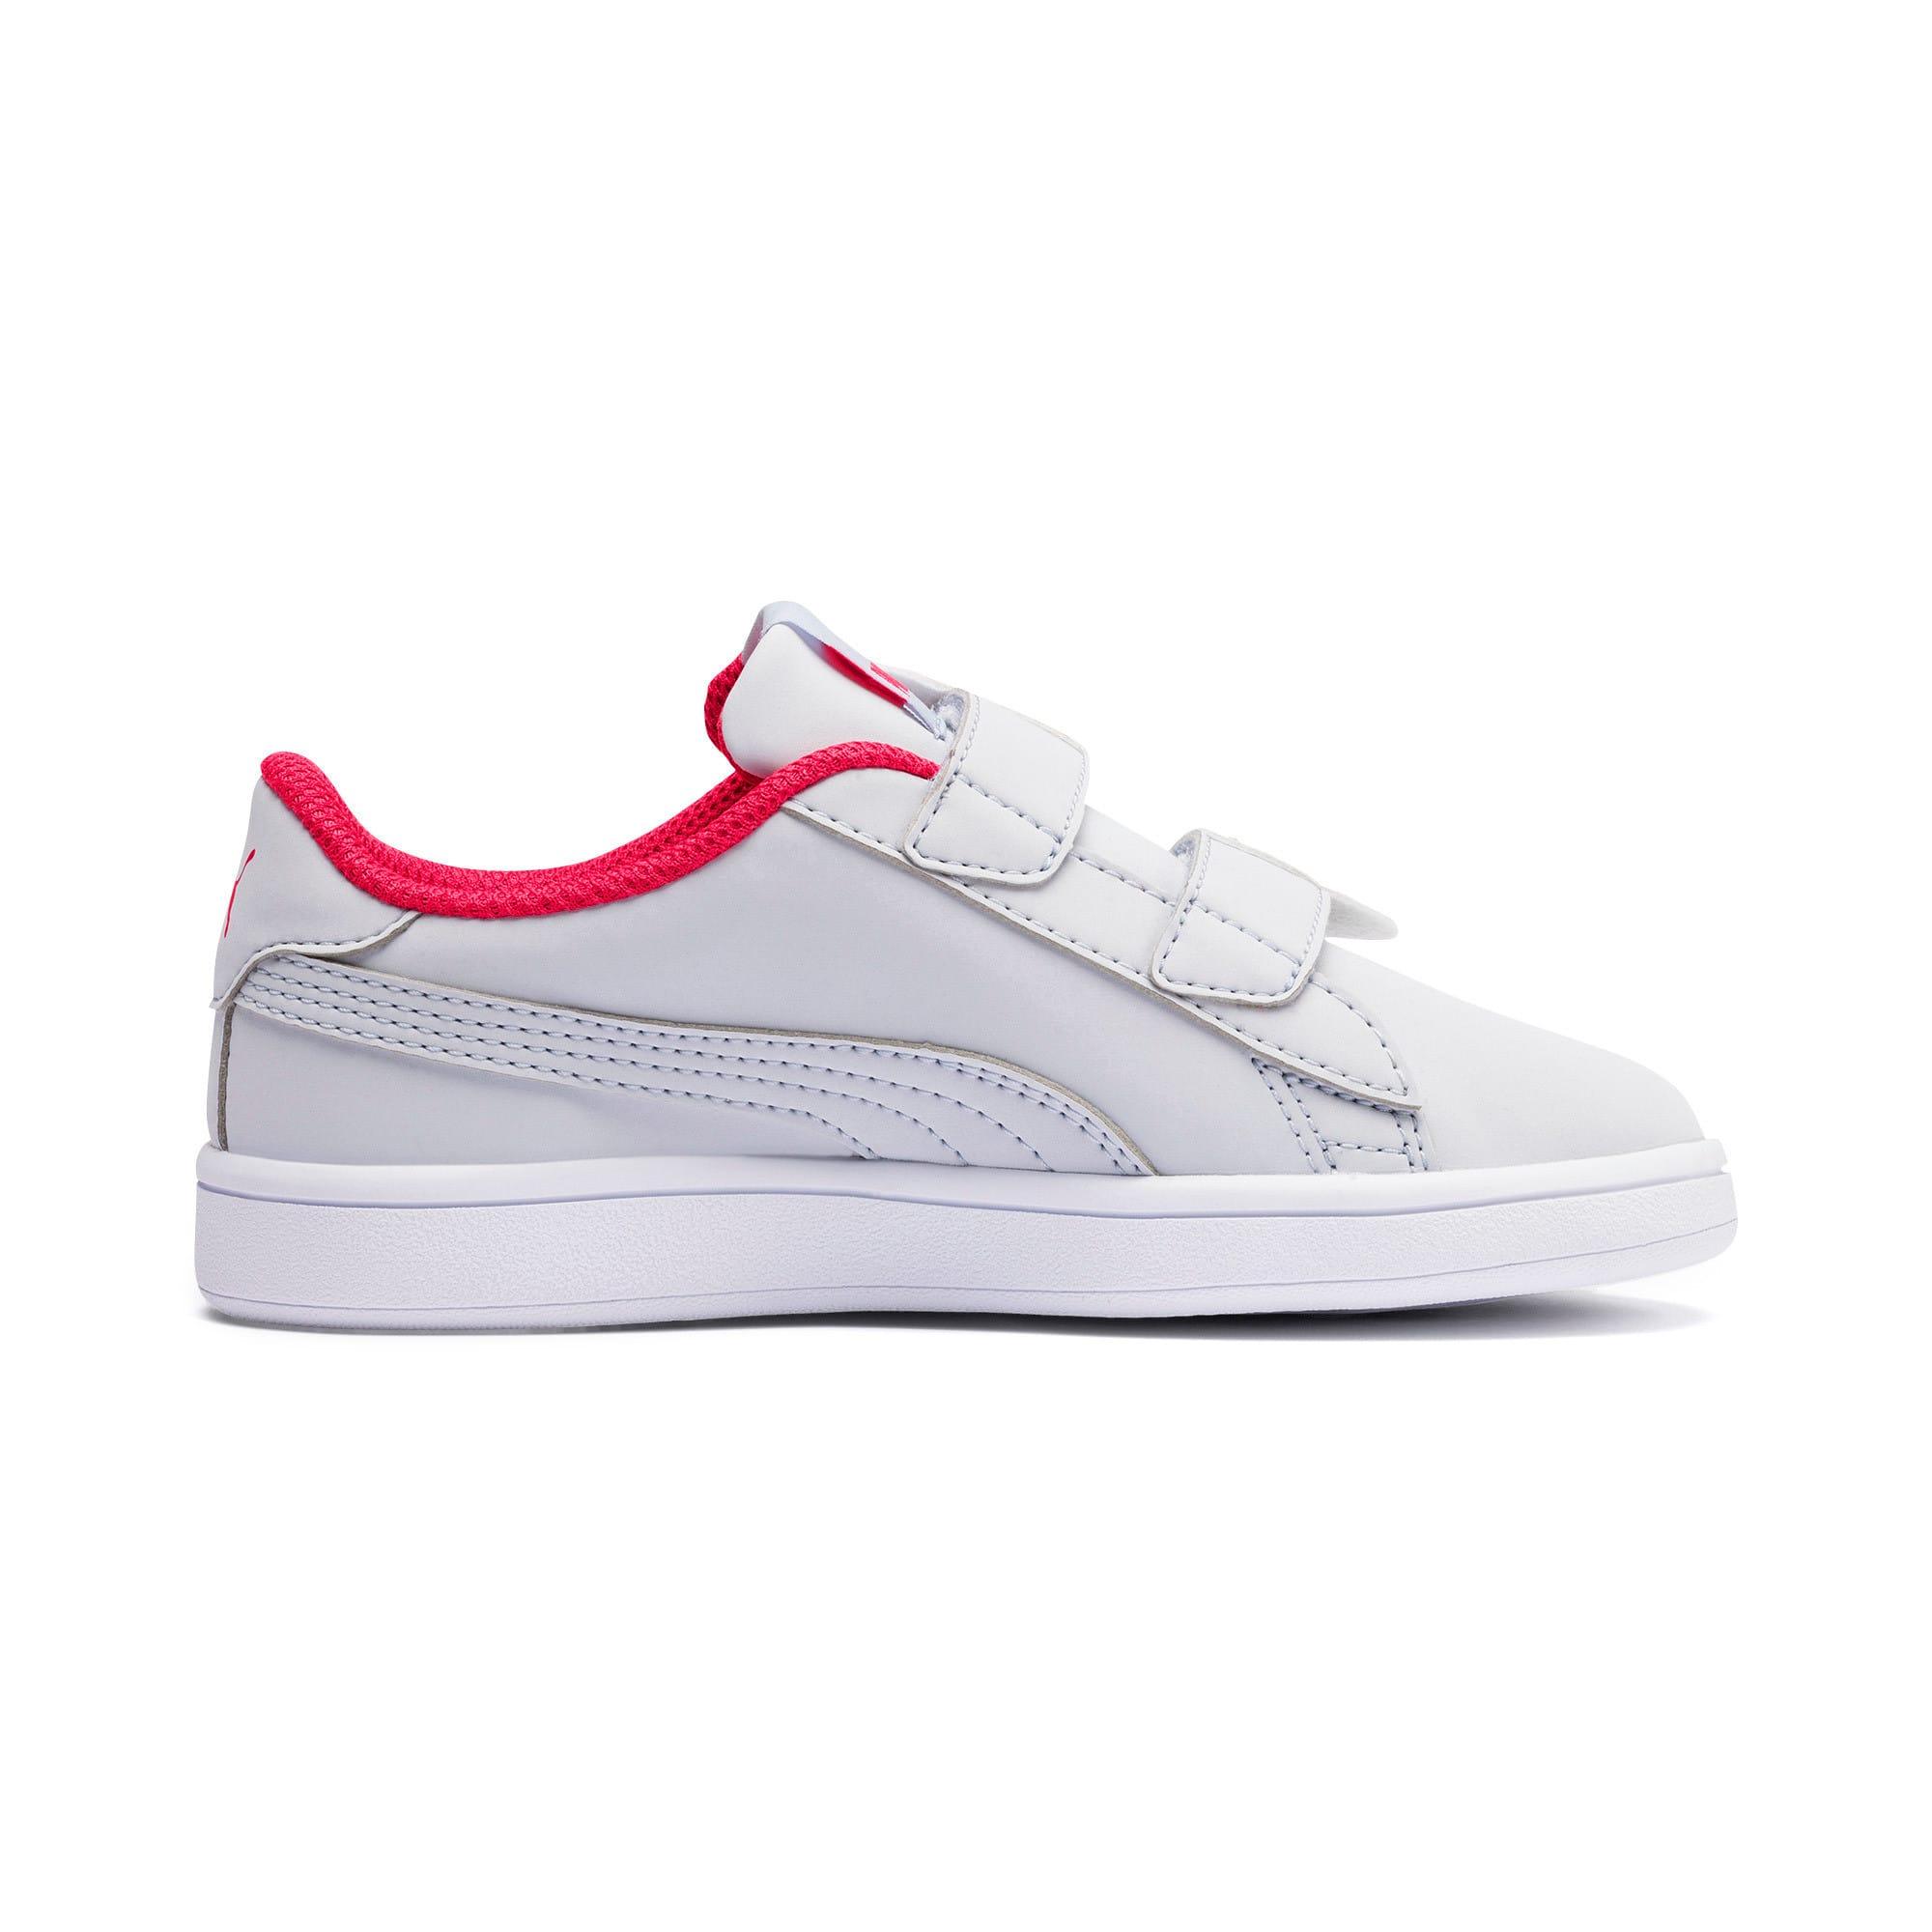 Thumbnail 5 of Puma Smash v2 Butterfly Little Kids' Shoes, Heather-Nrgy Rose-Puma White, medium